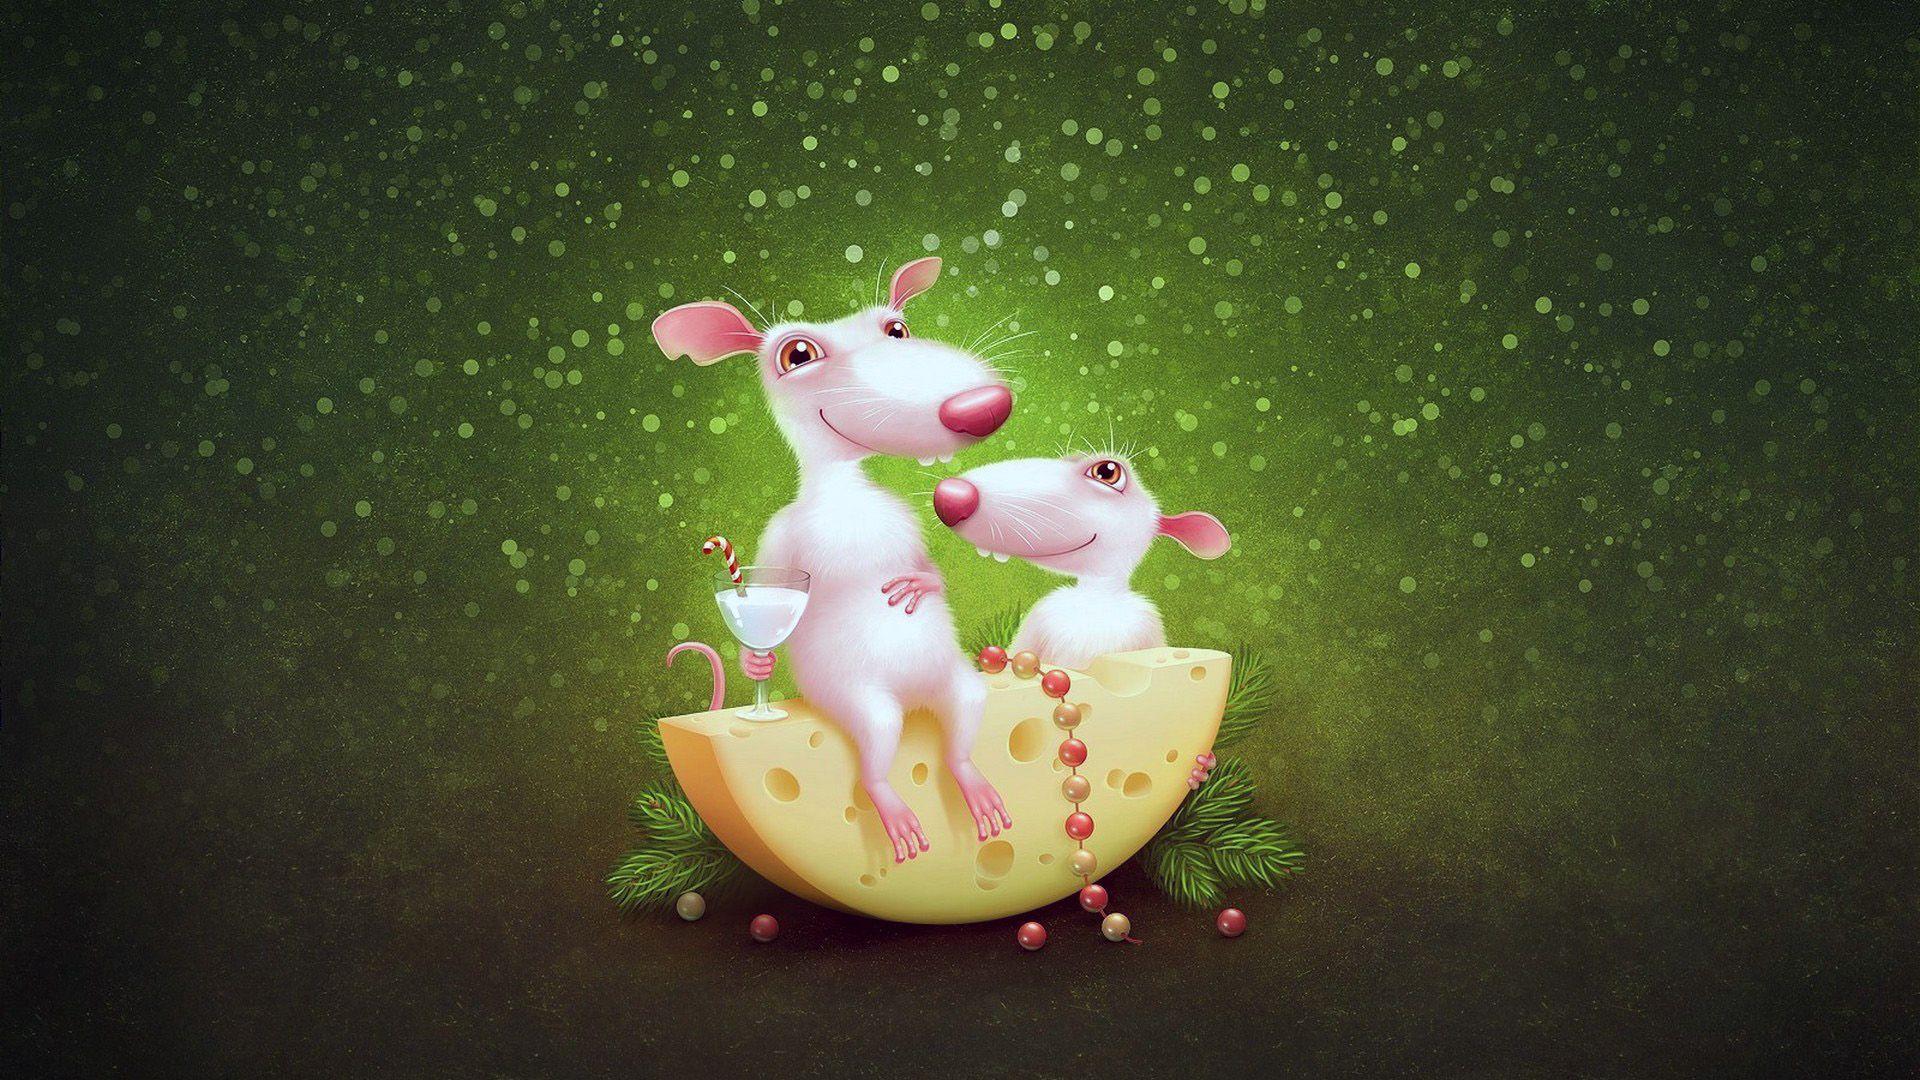 Christmas White Rat Background